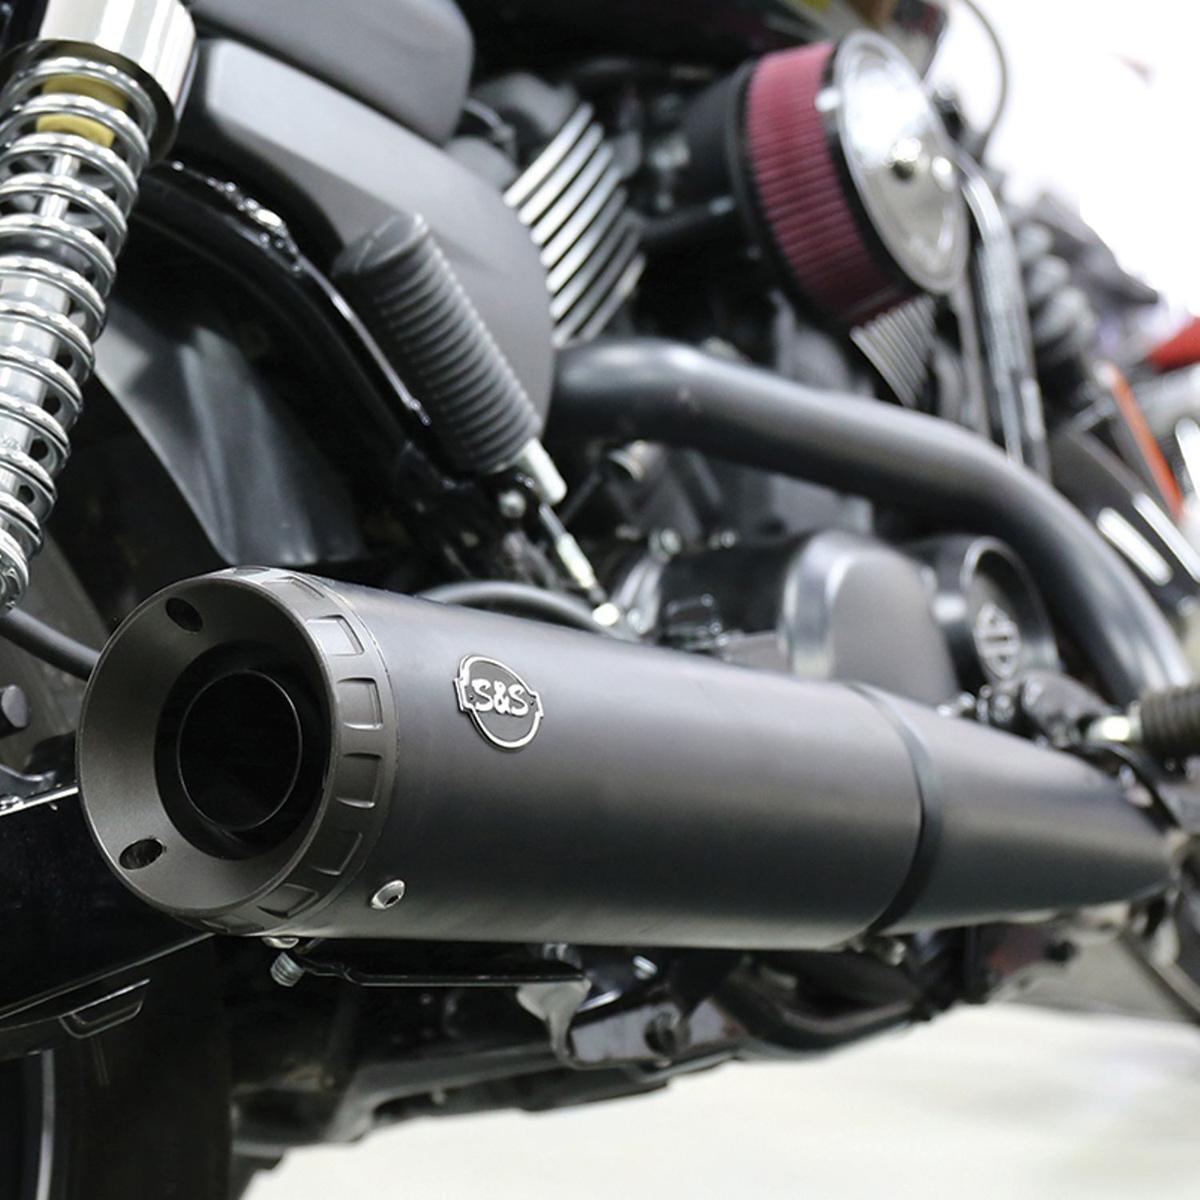 S&S Cycle Grand National Black Slip-On Muffler - 550-0703